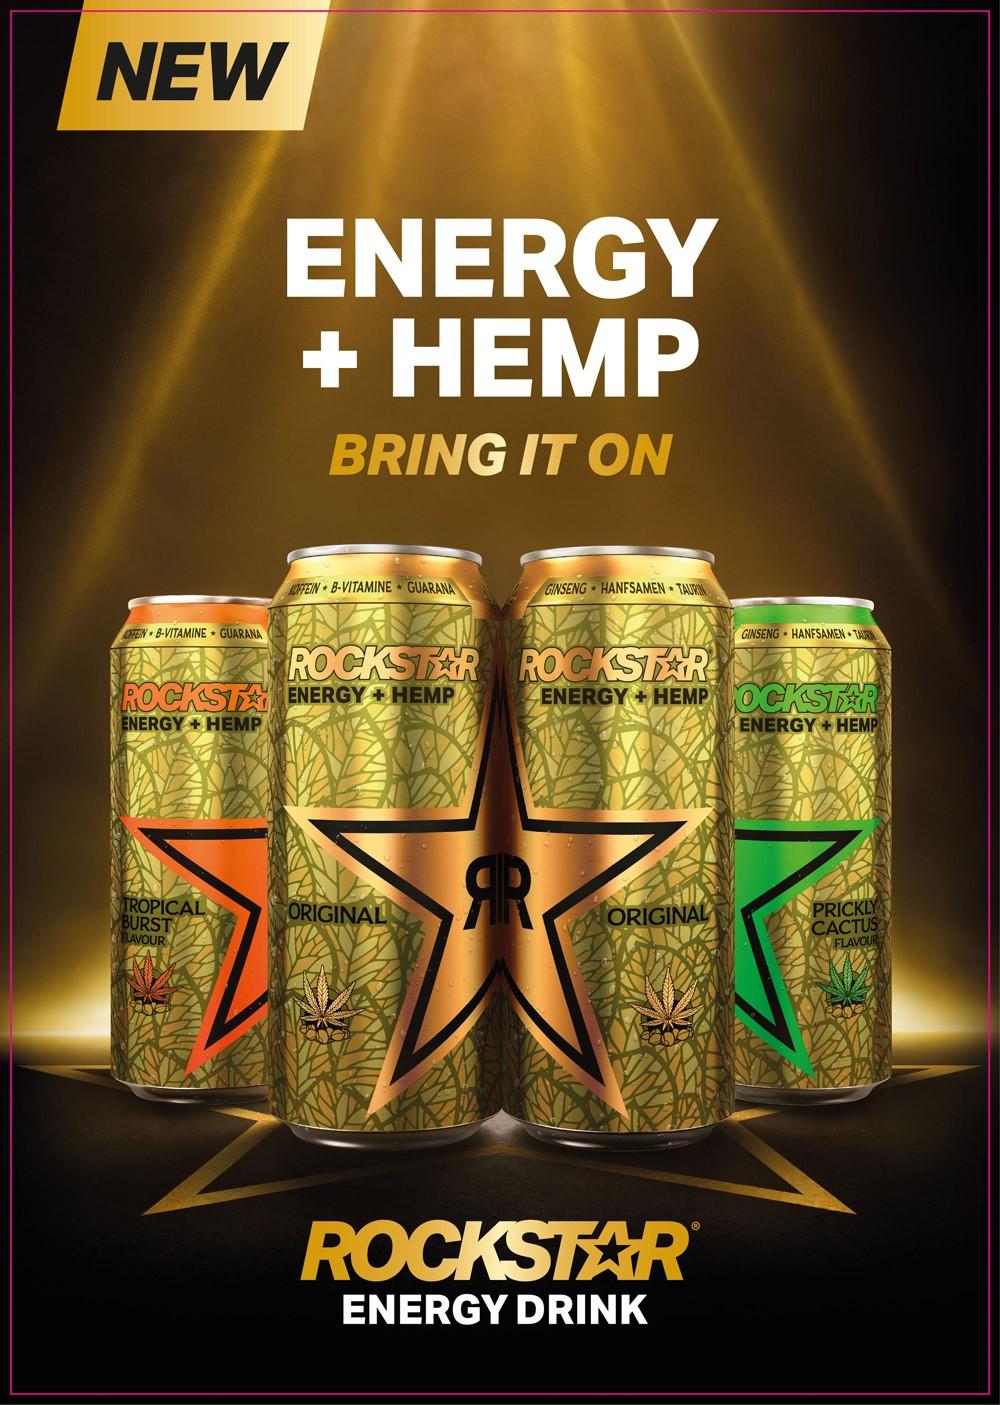 Energy Drink mit Hanfsamenextrakt: PepsiCo launcht Rockstar Energy + HEMP